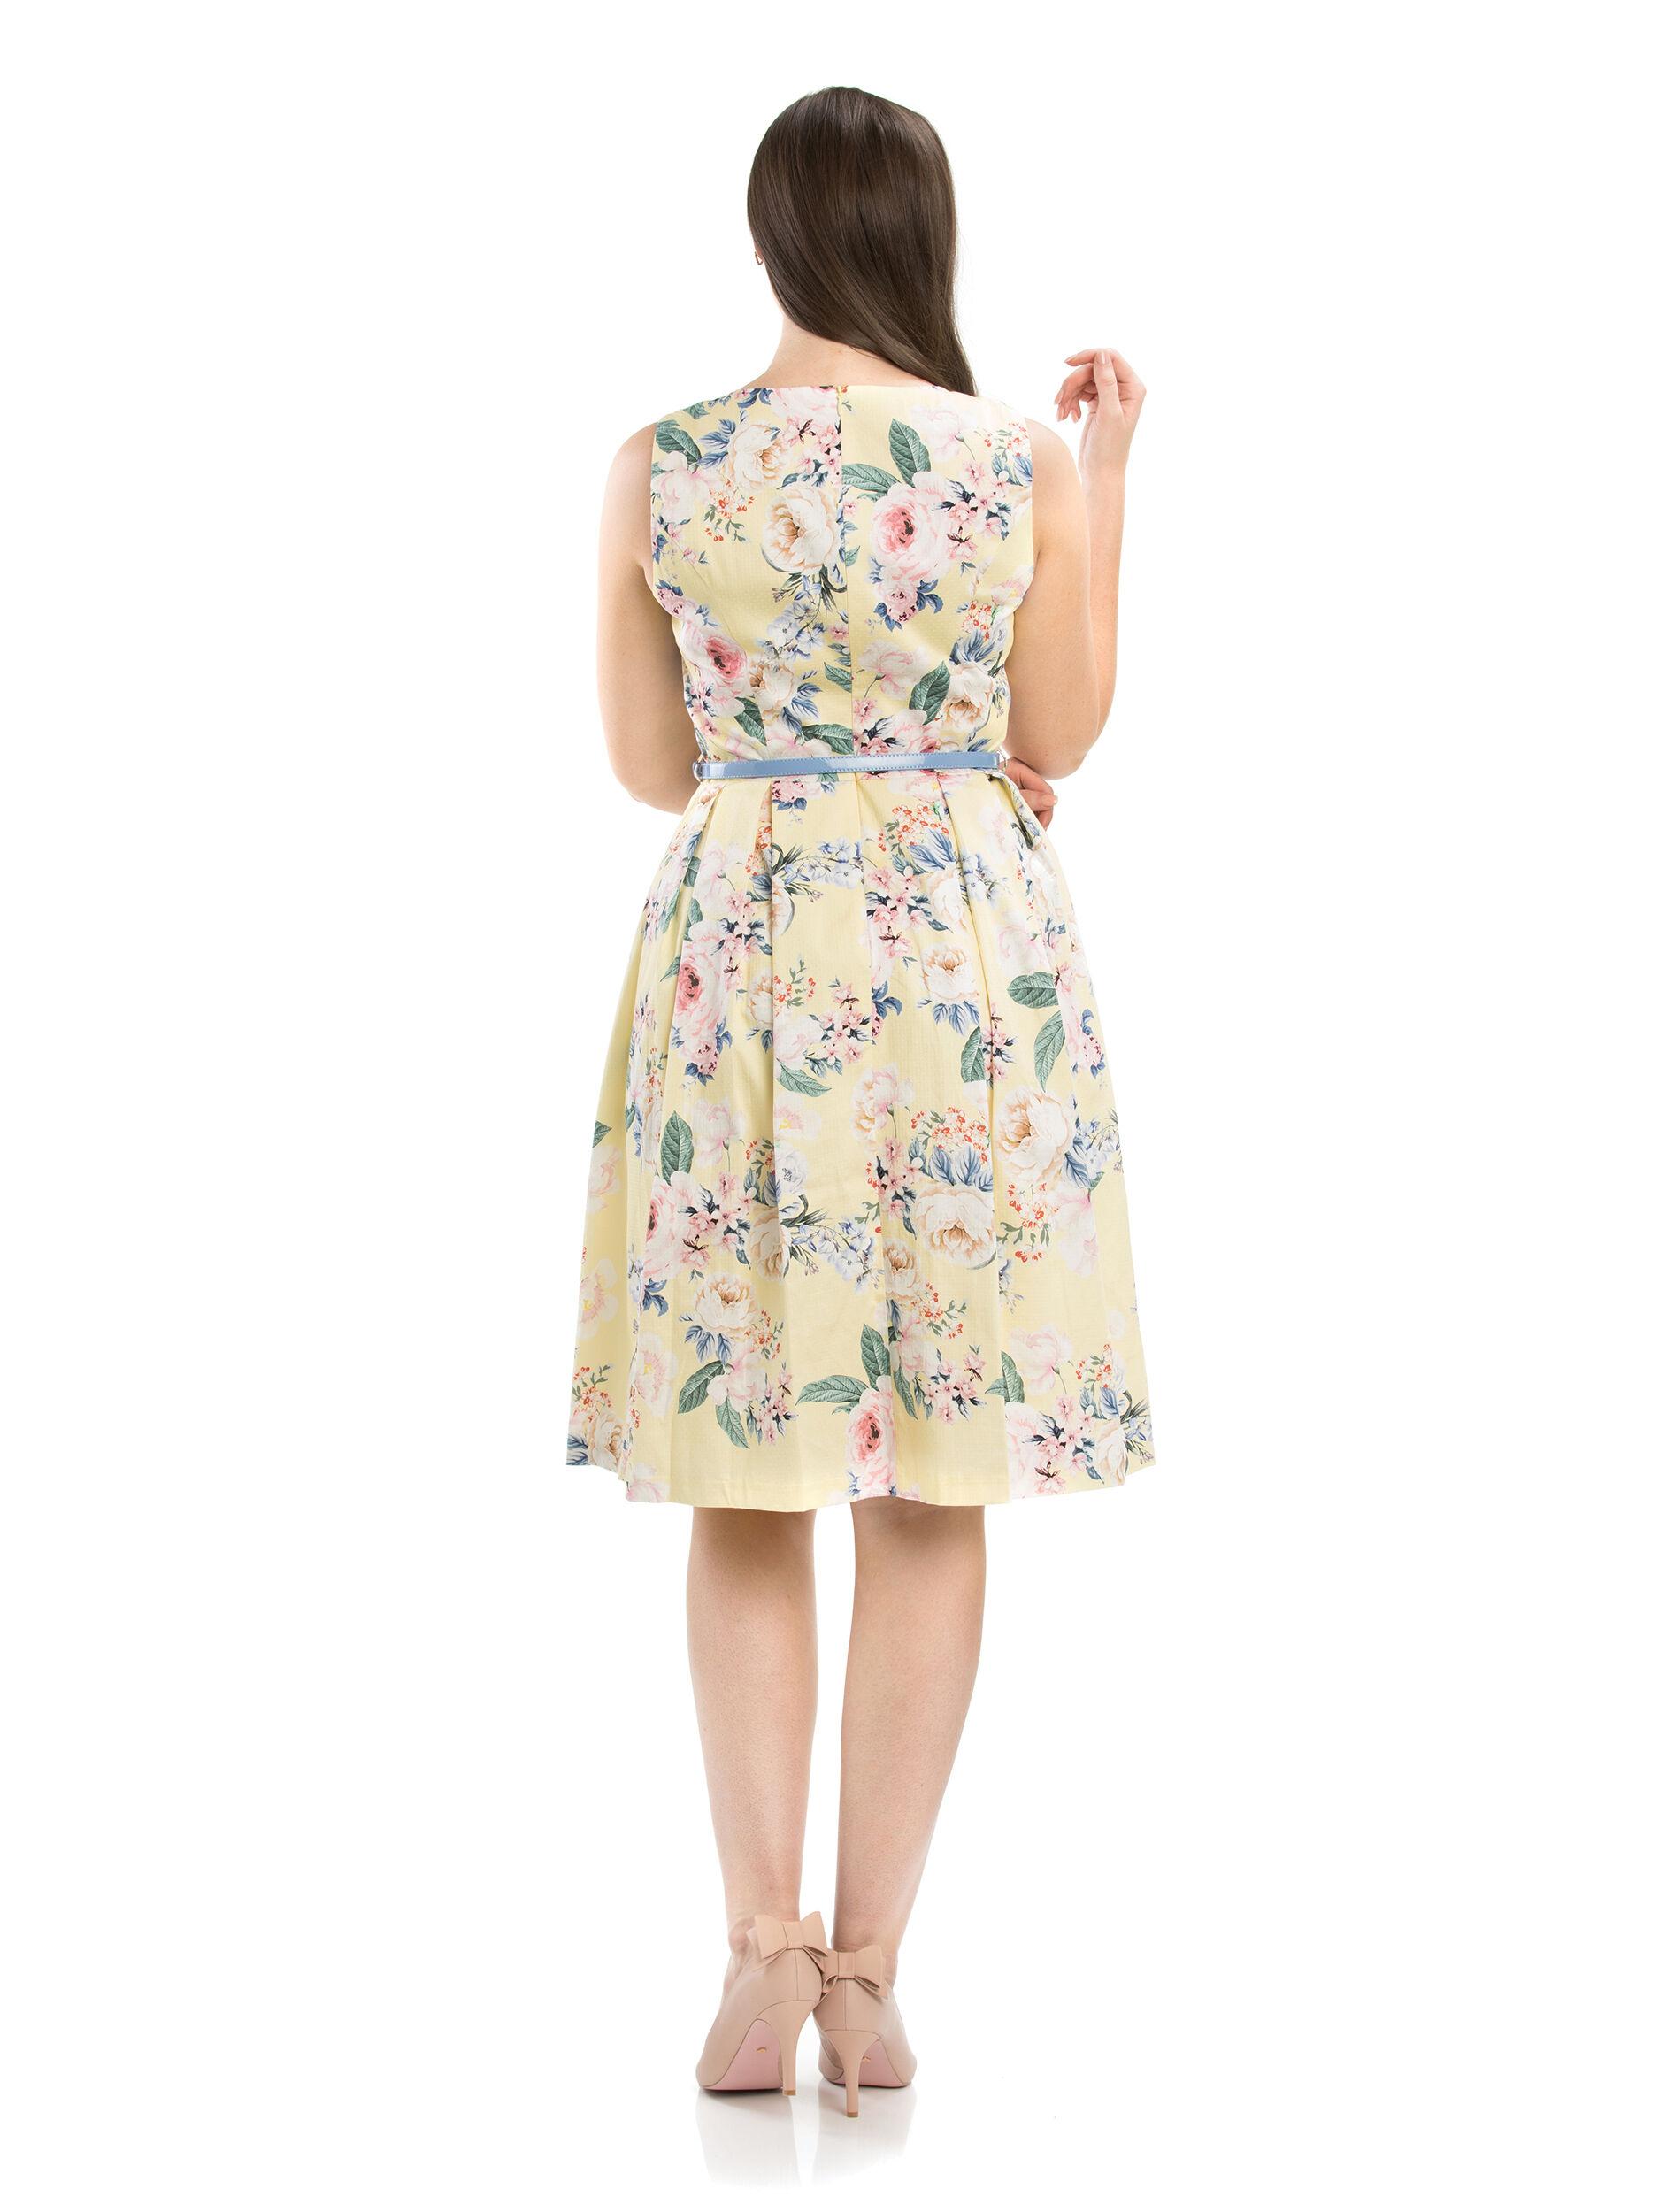 Neroli Floral Dress